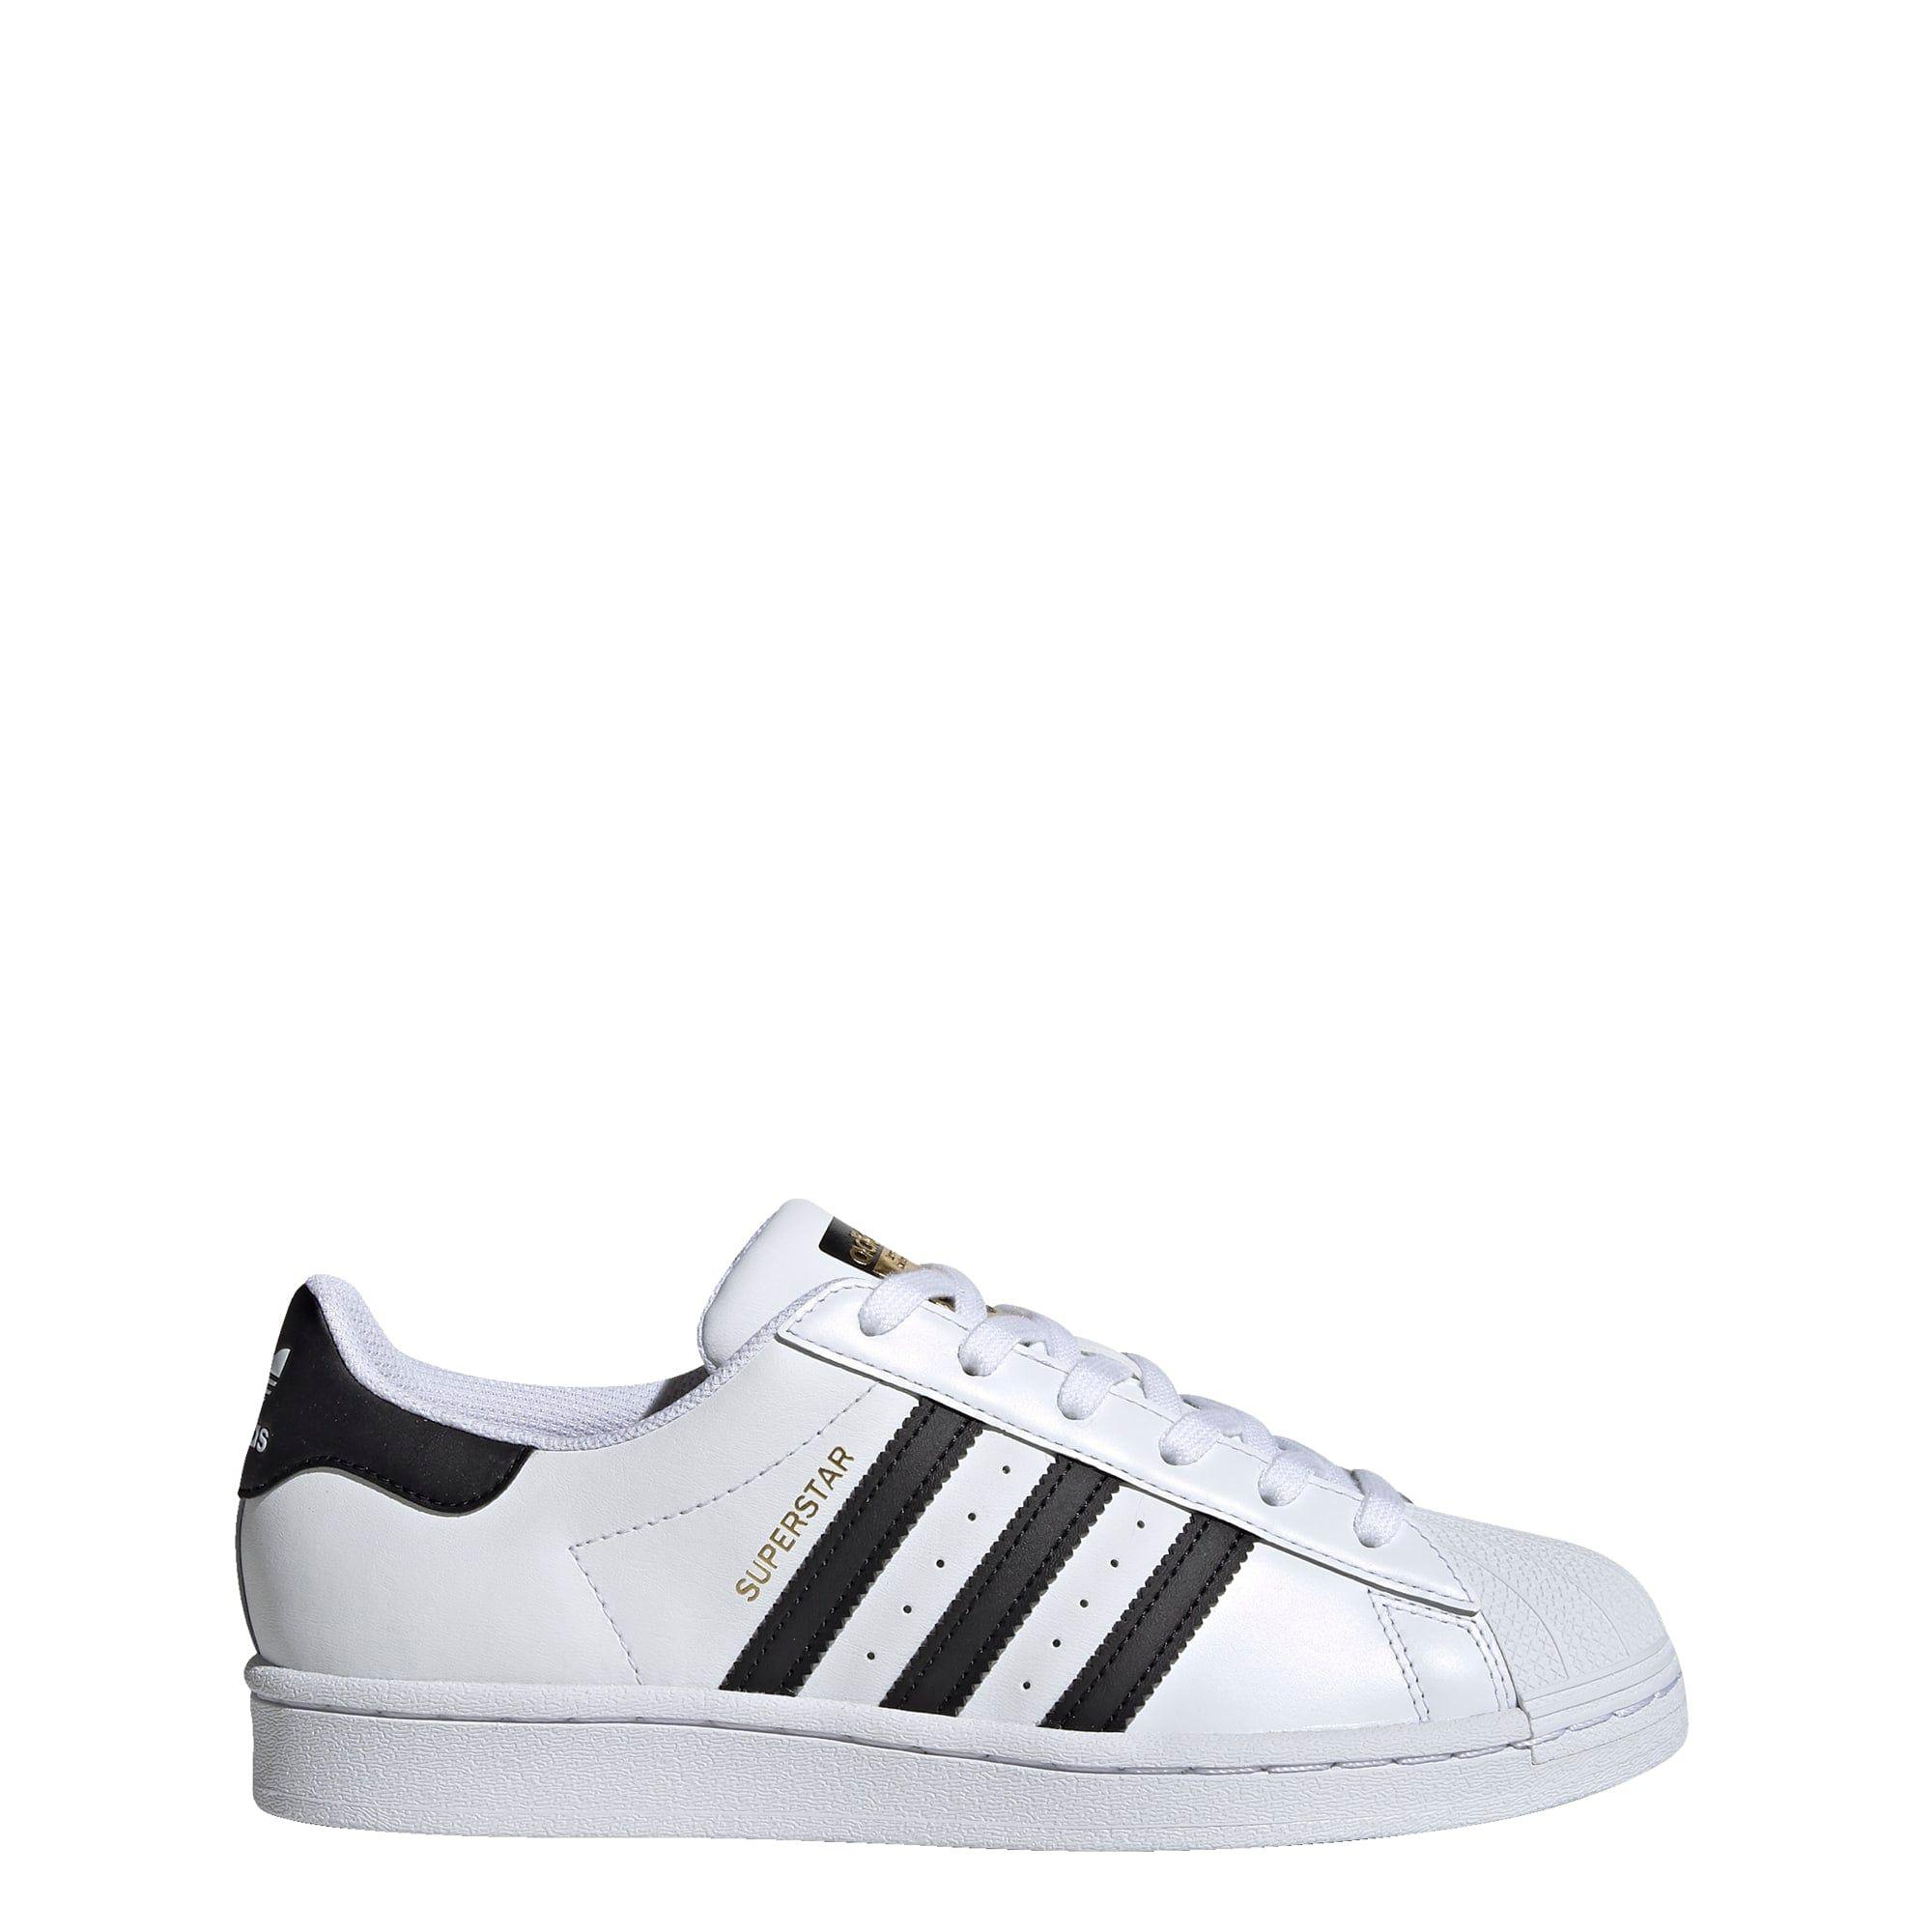 ADIDAS ORIGINALS Sneaker in schwarz / weiß in 2020 ...